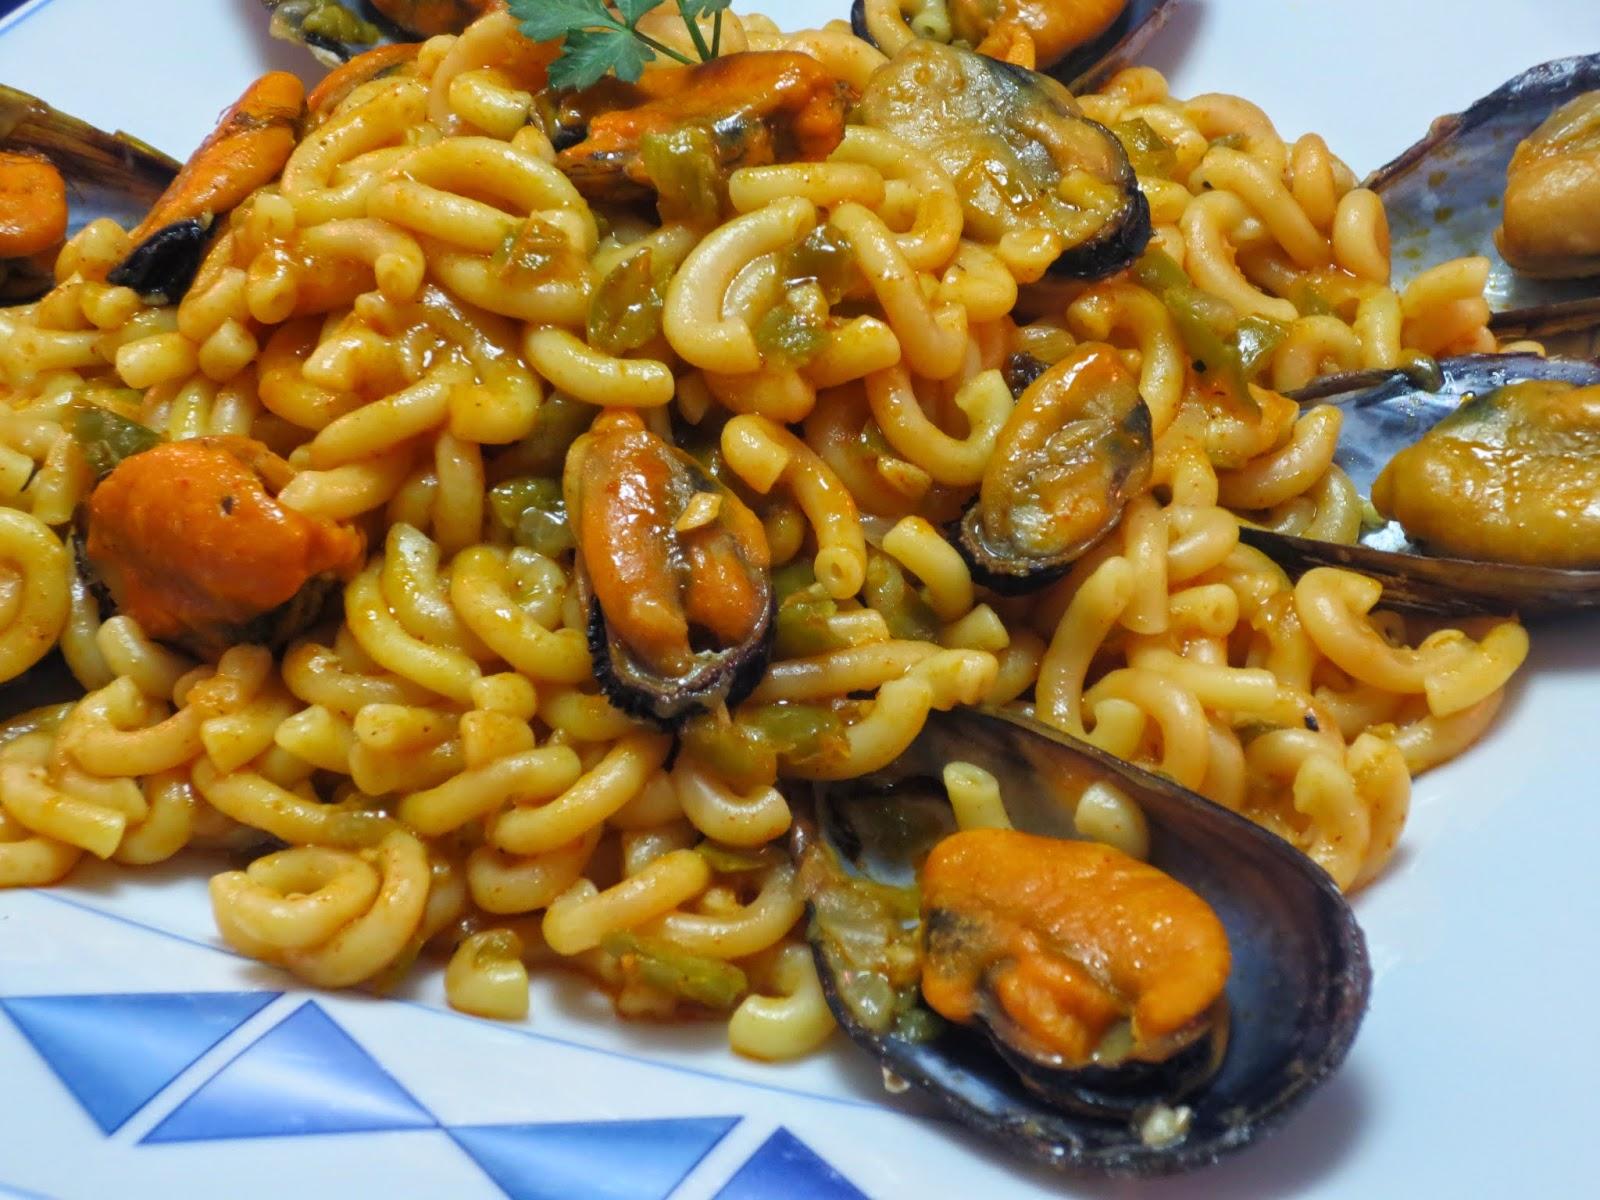 Fideuá con mejillones Ana Sevilla cocina tradicional